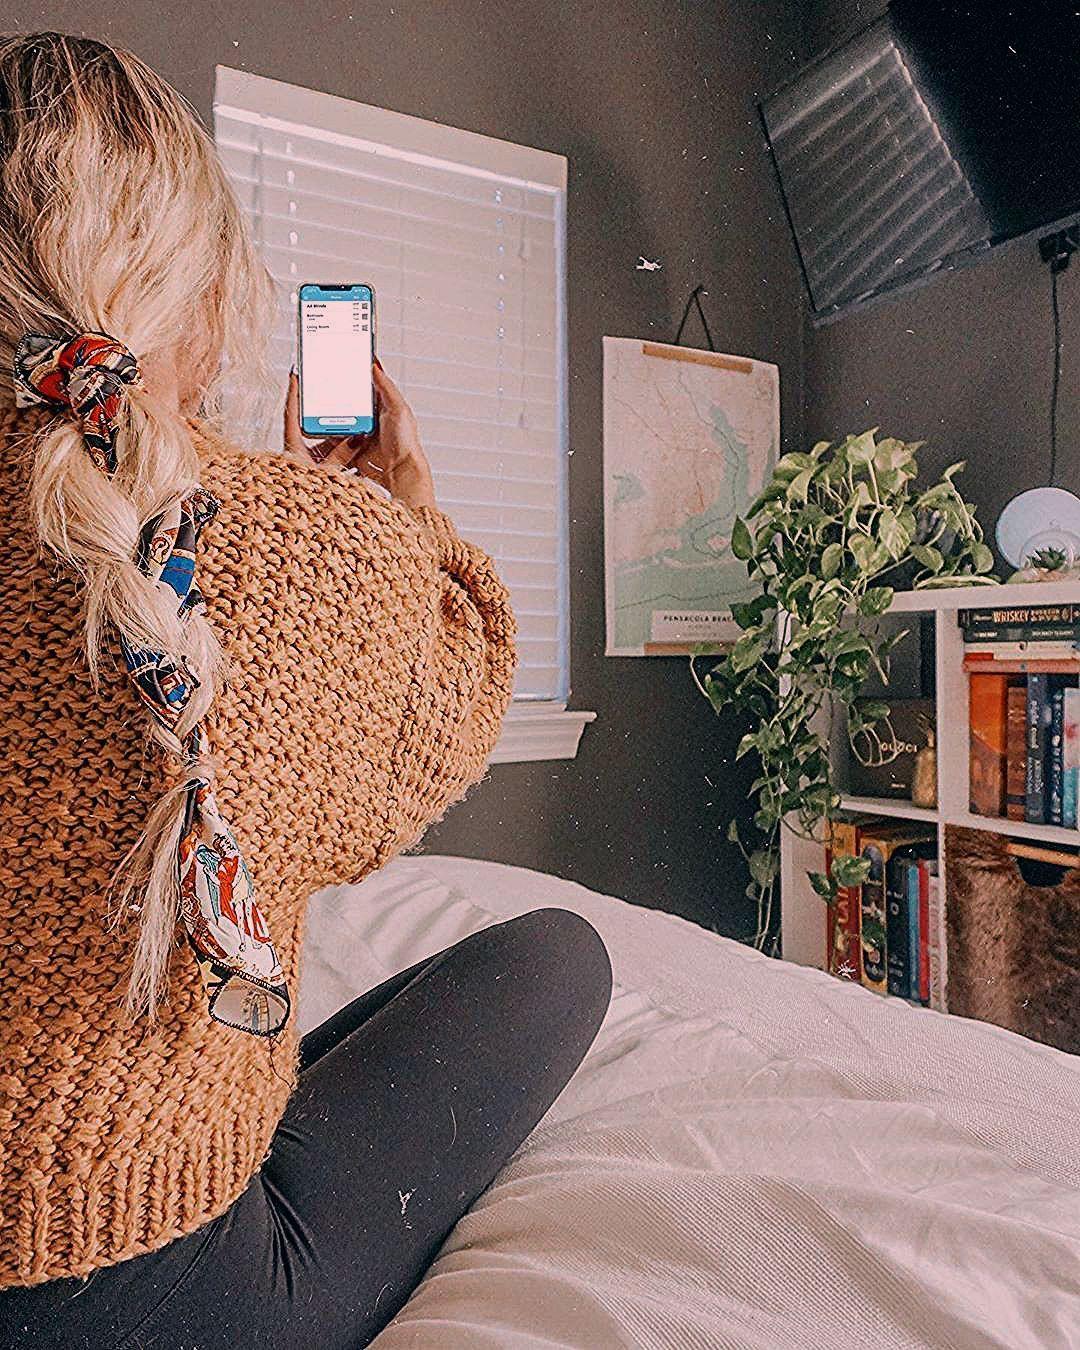 Boho Bedroom Aesthetic DIY Ideas home decor boho aesthetic ...